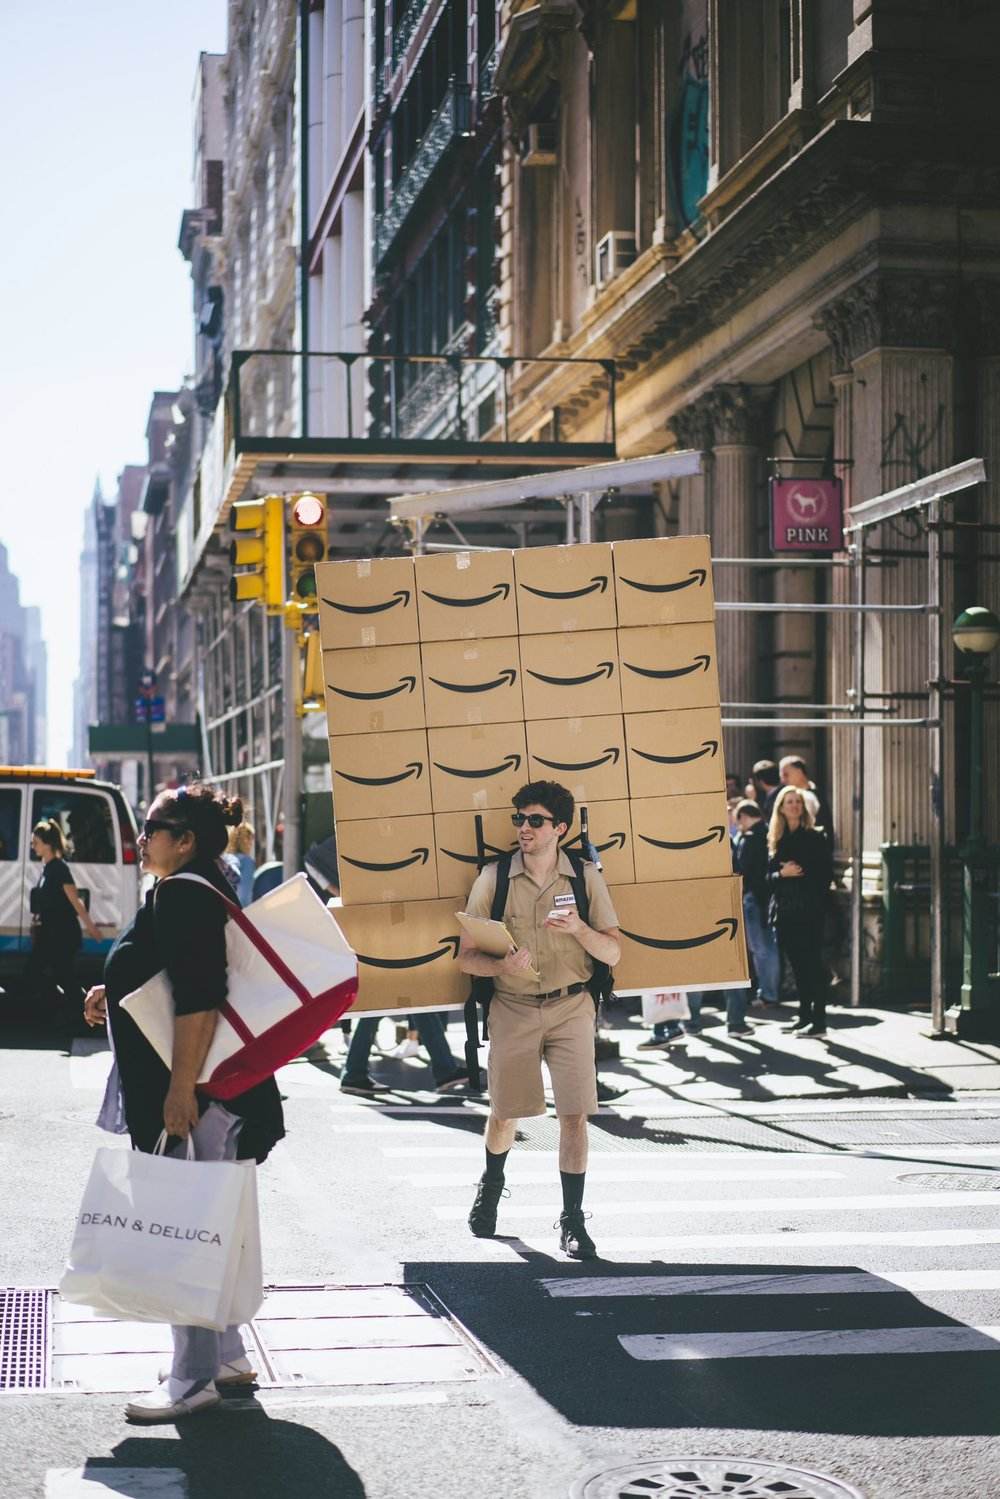 new_york_city_street_photography_38.jpg